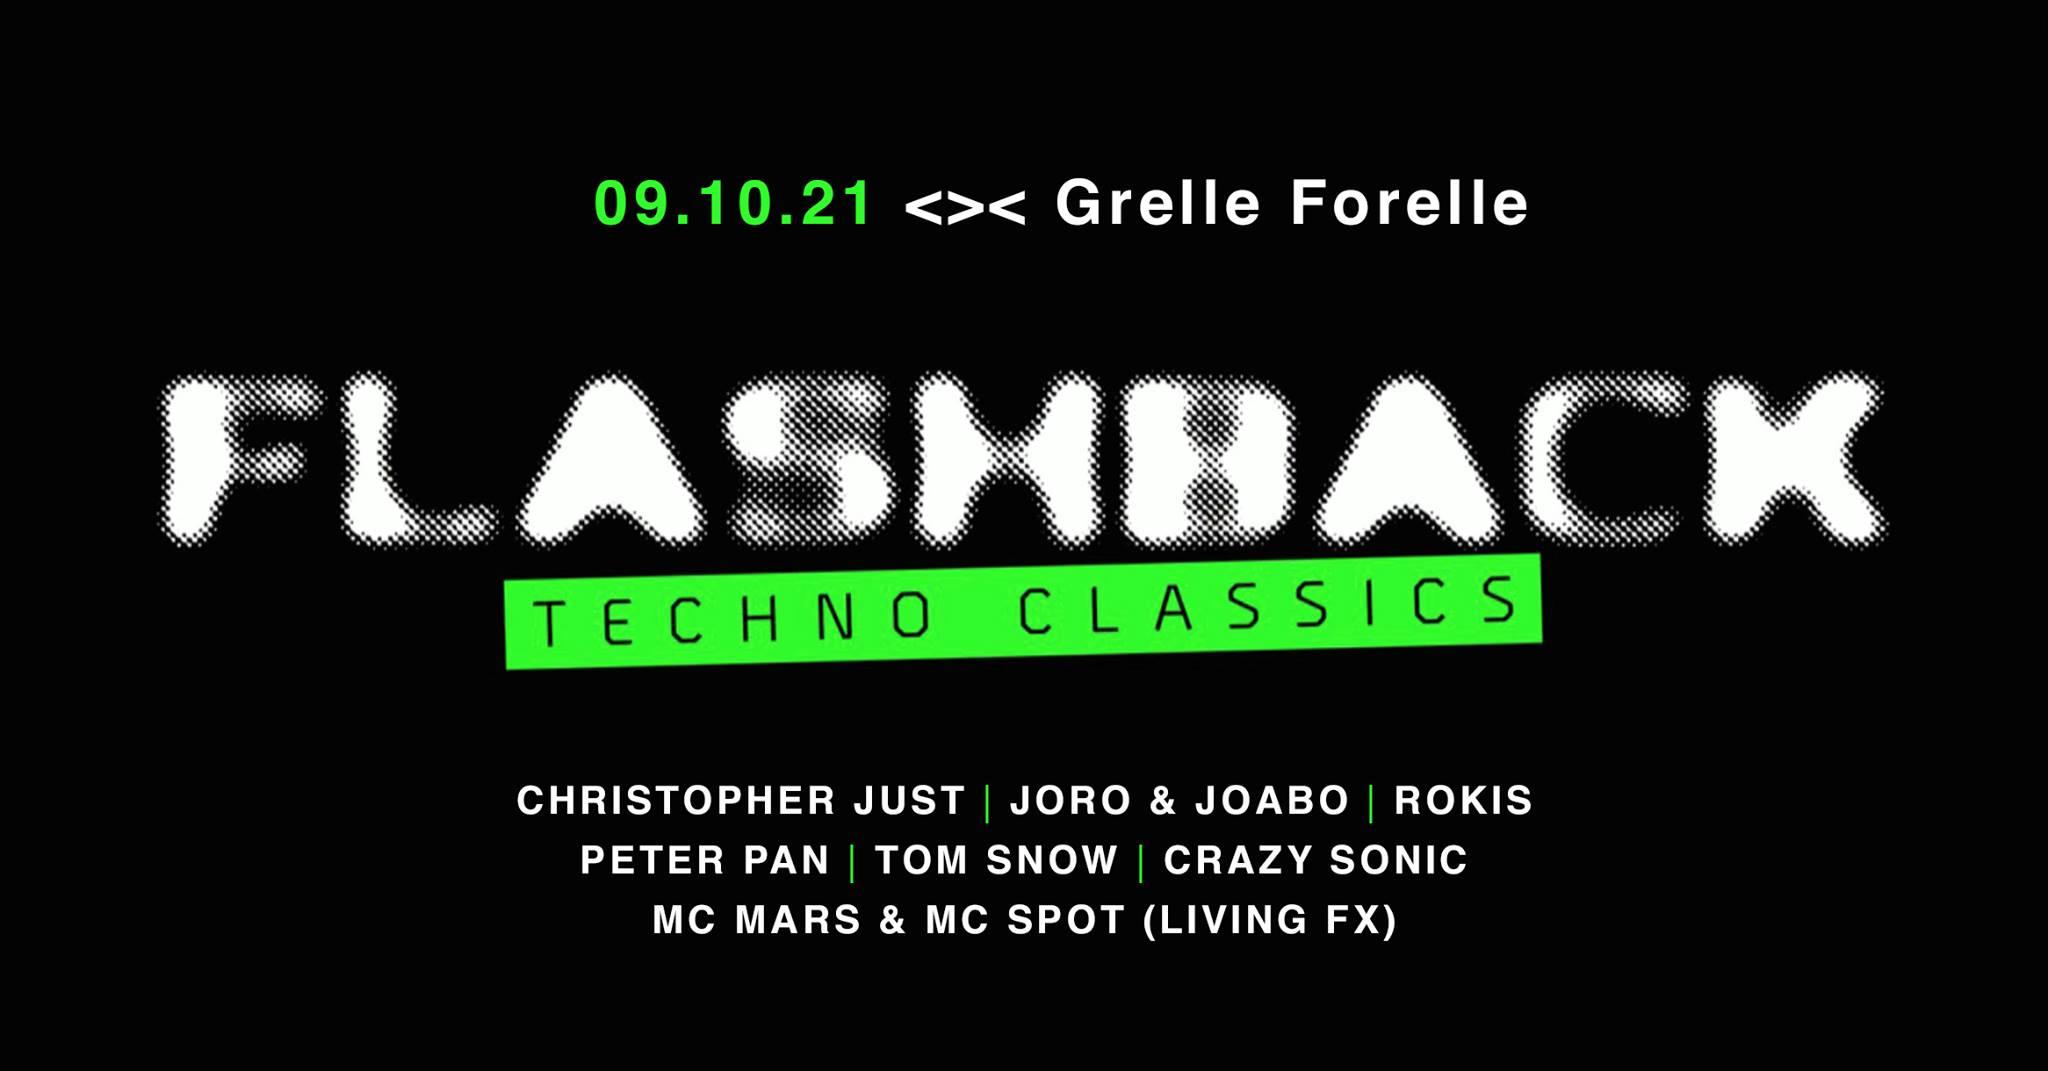 Events Wien: FLASHBACK Techno Classics @ GRELLE FORELLE